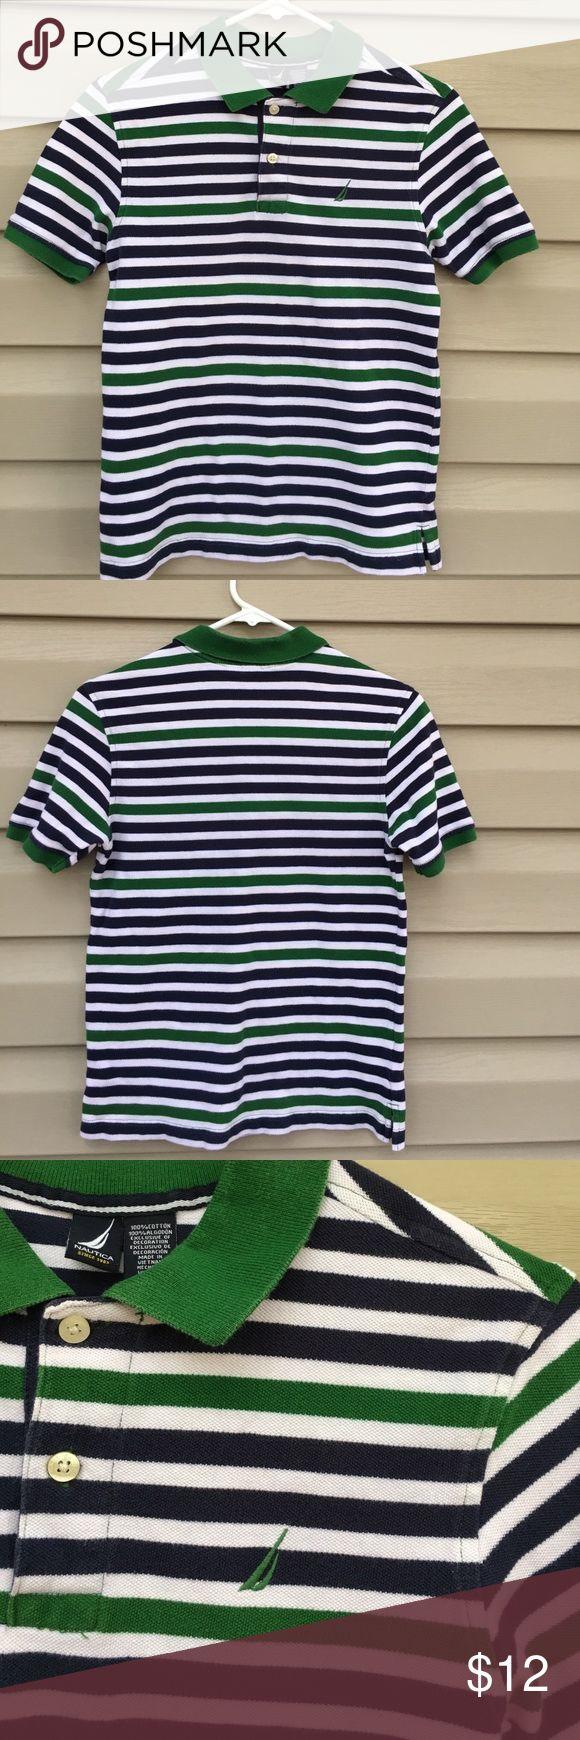 Nautica boys green/ navy striped polo shirt Nice boys striped polo 100% cotton, no stains or holes, or fading Nautica Shirts & Tops Polos